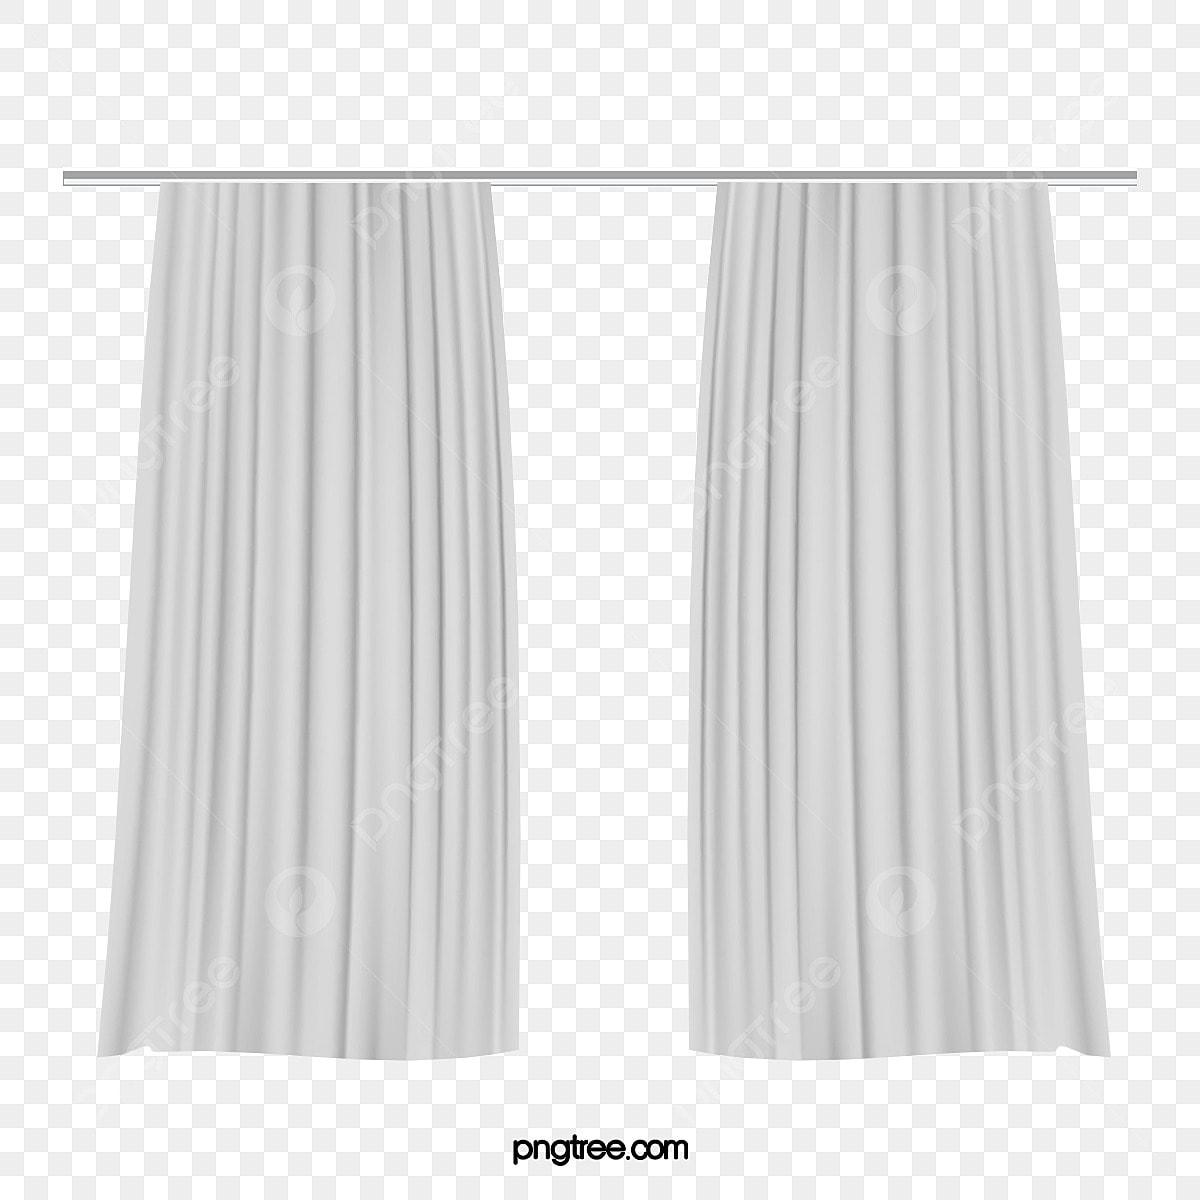 White Elegant Curtain Material Object